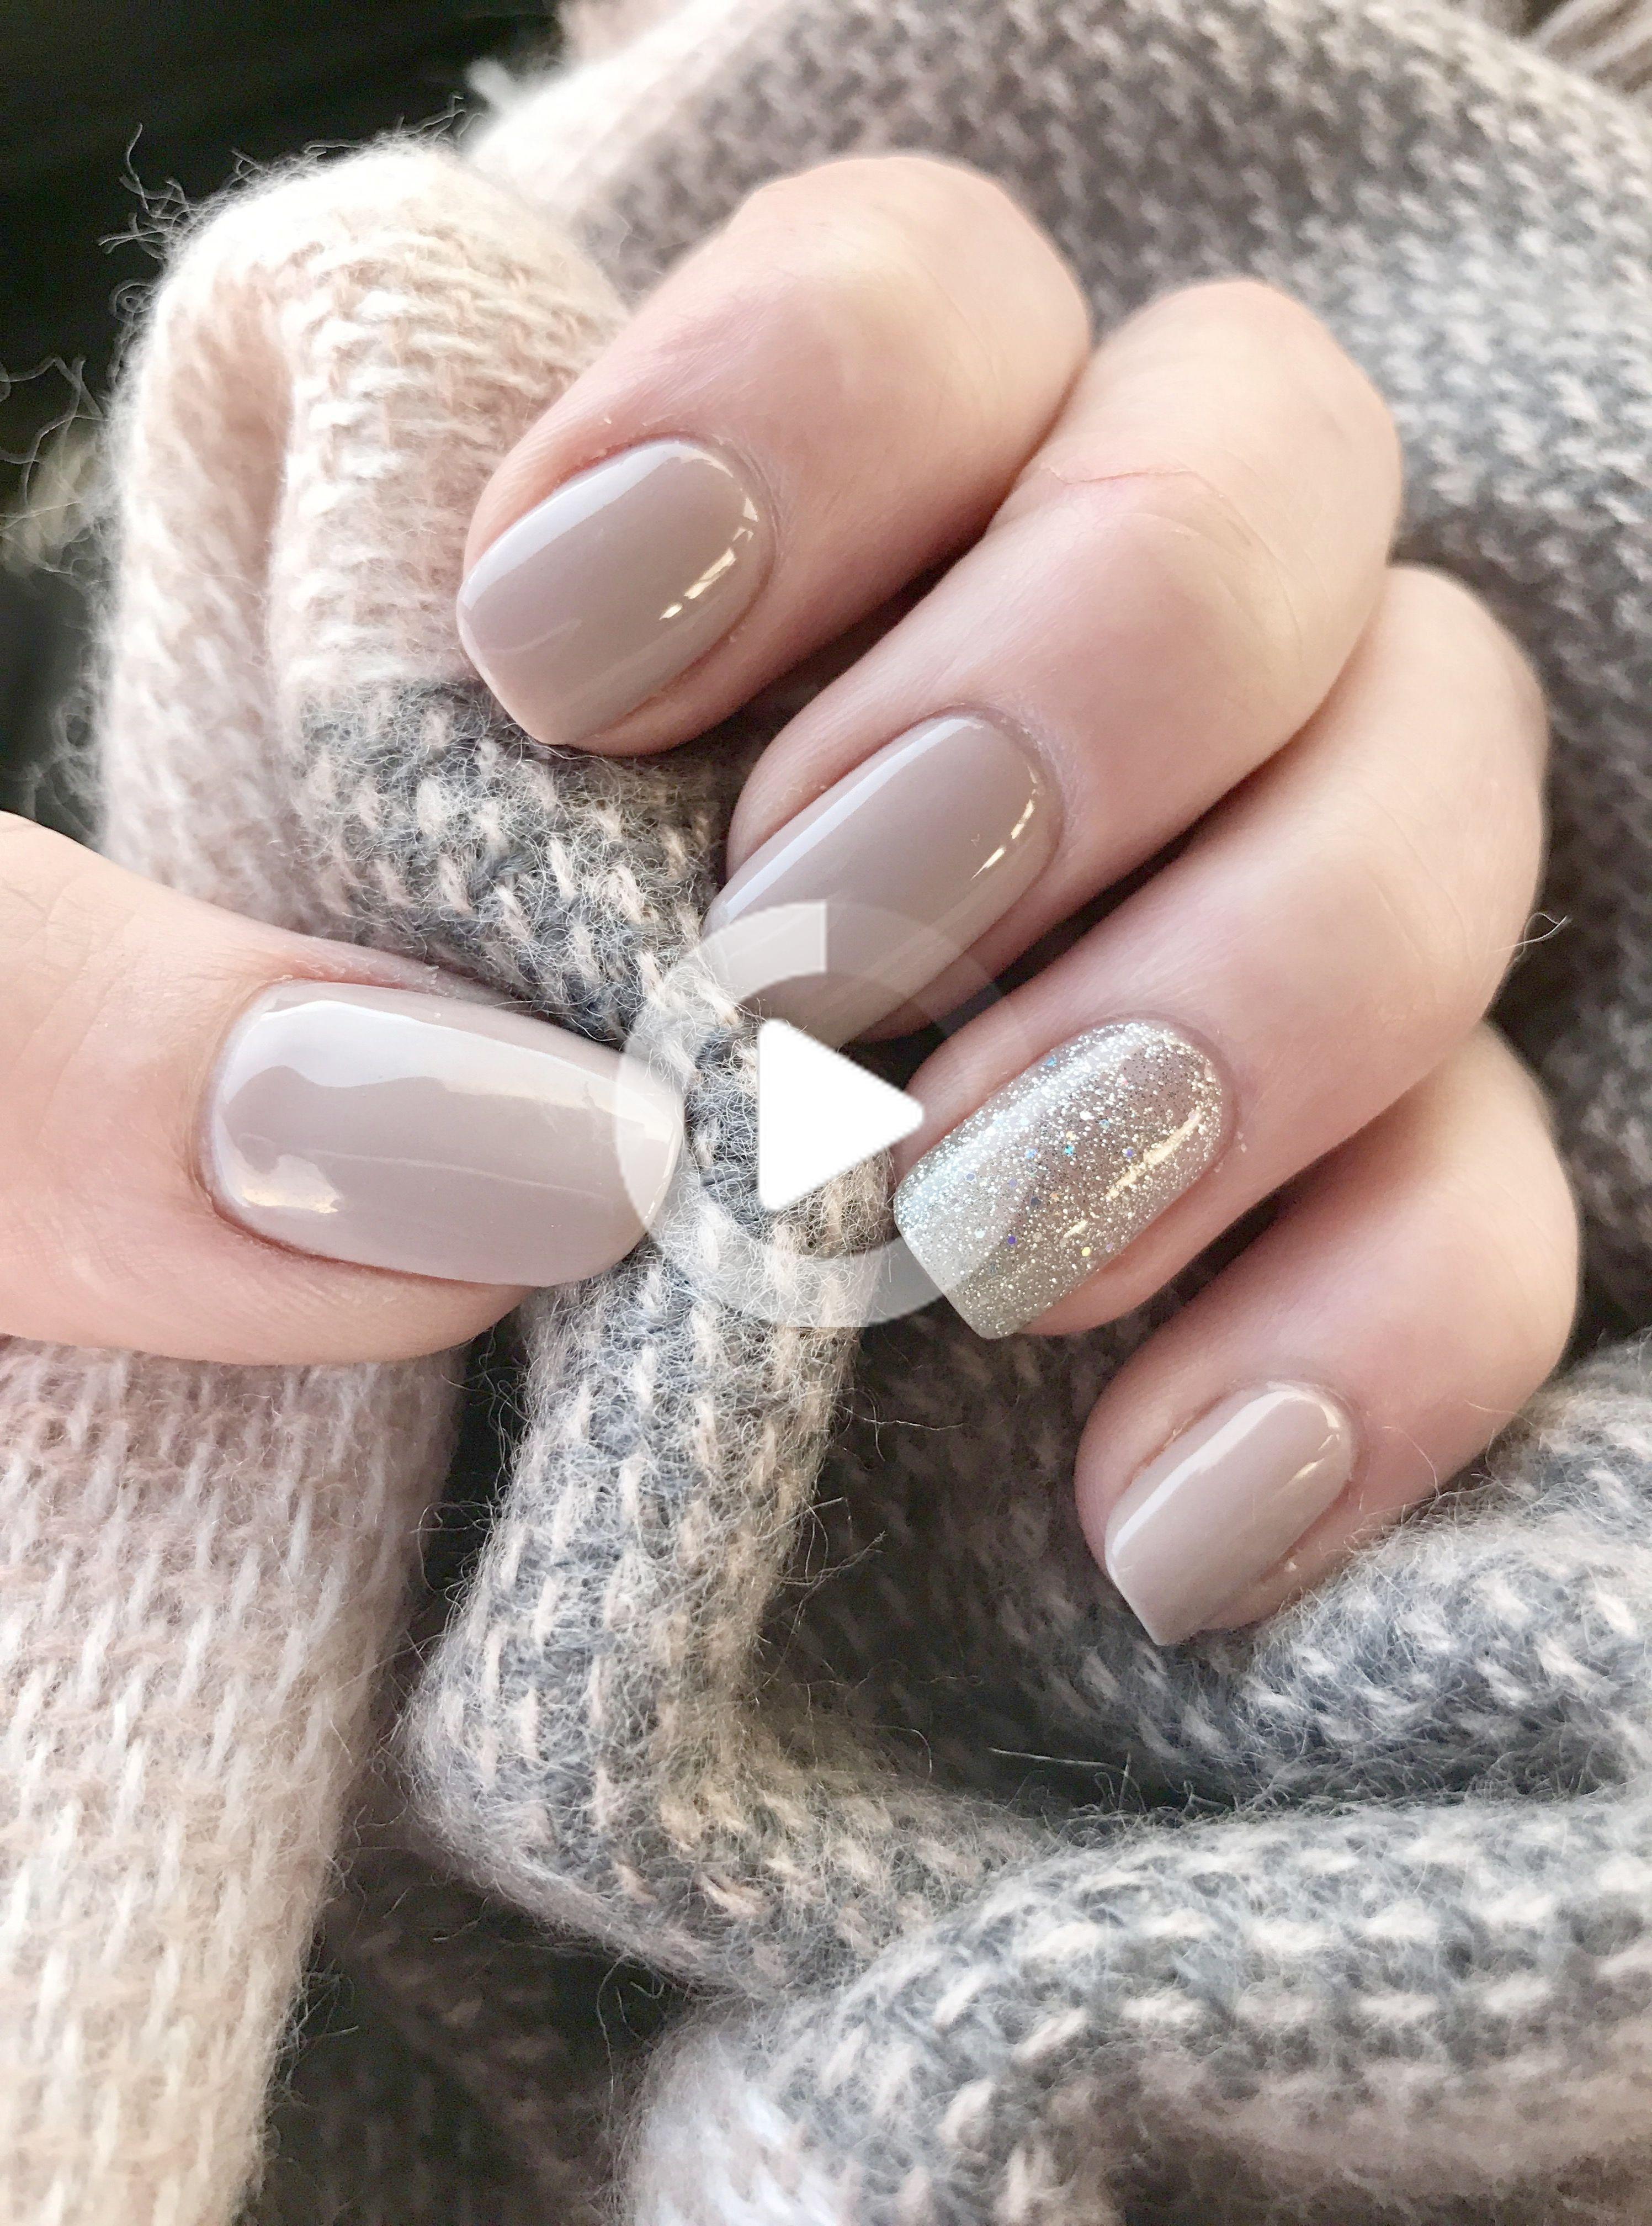 ZOYA Nail Polish - Cute Nails Club in 2020 | Zoya nail ...